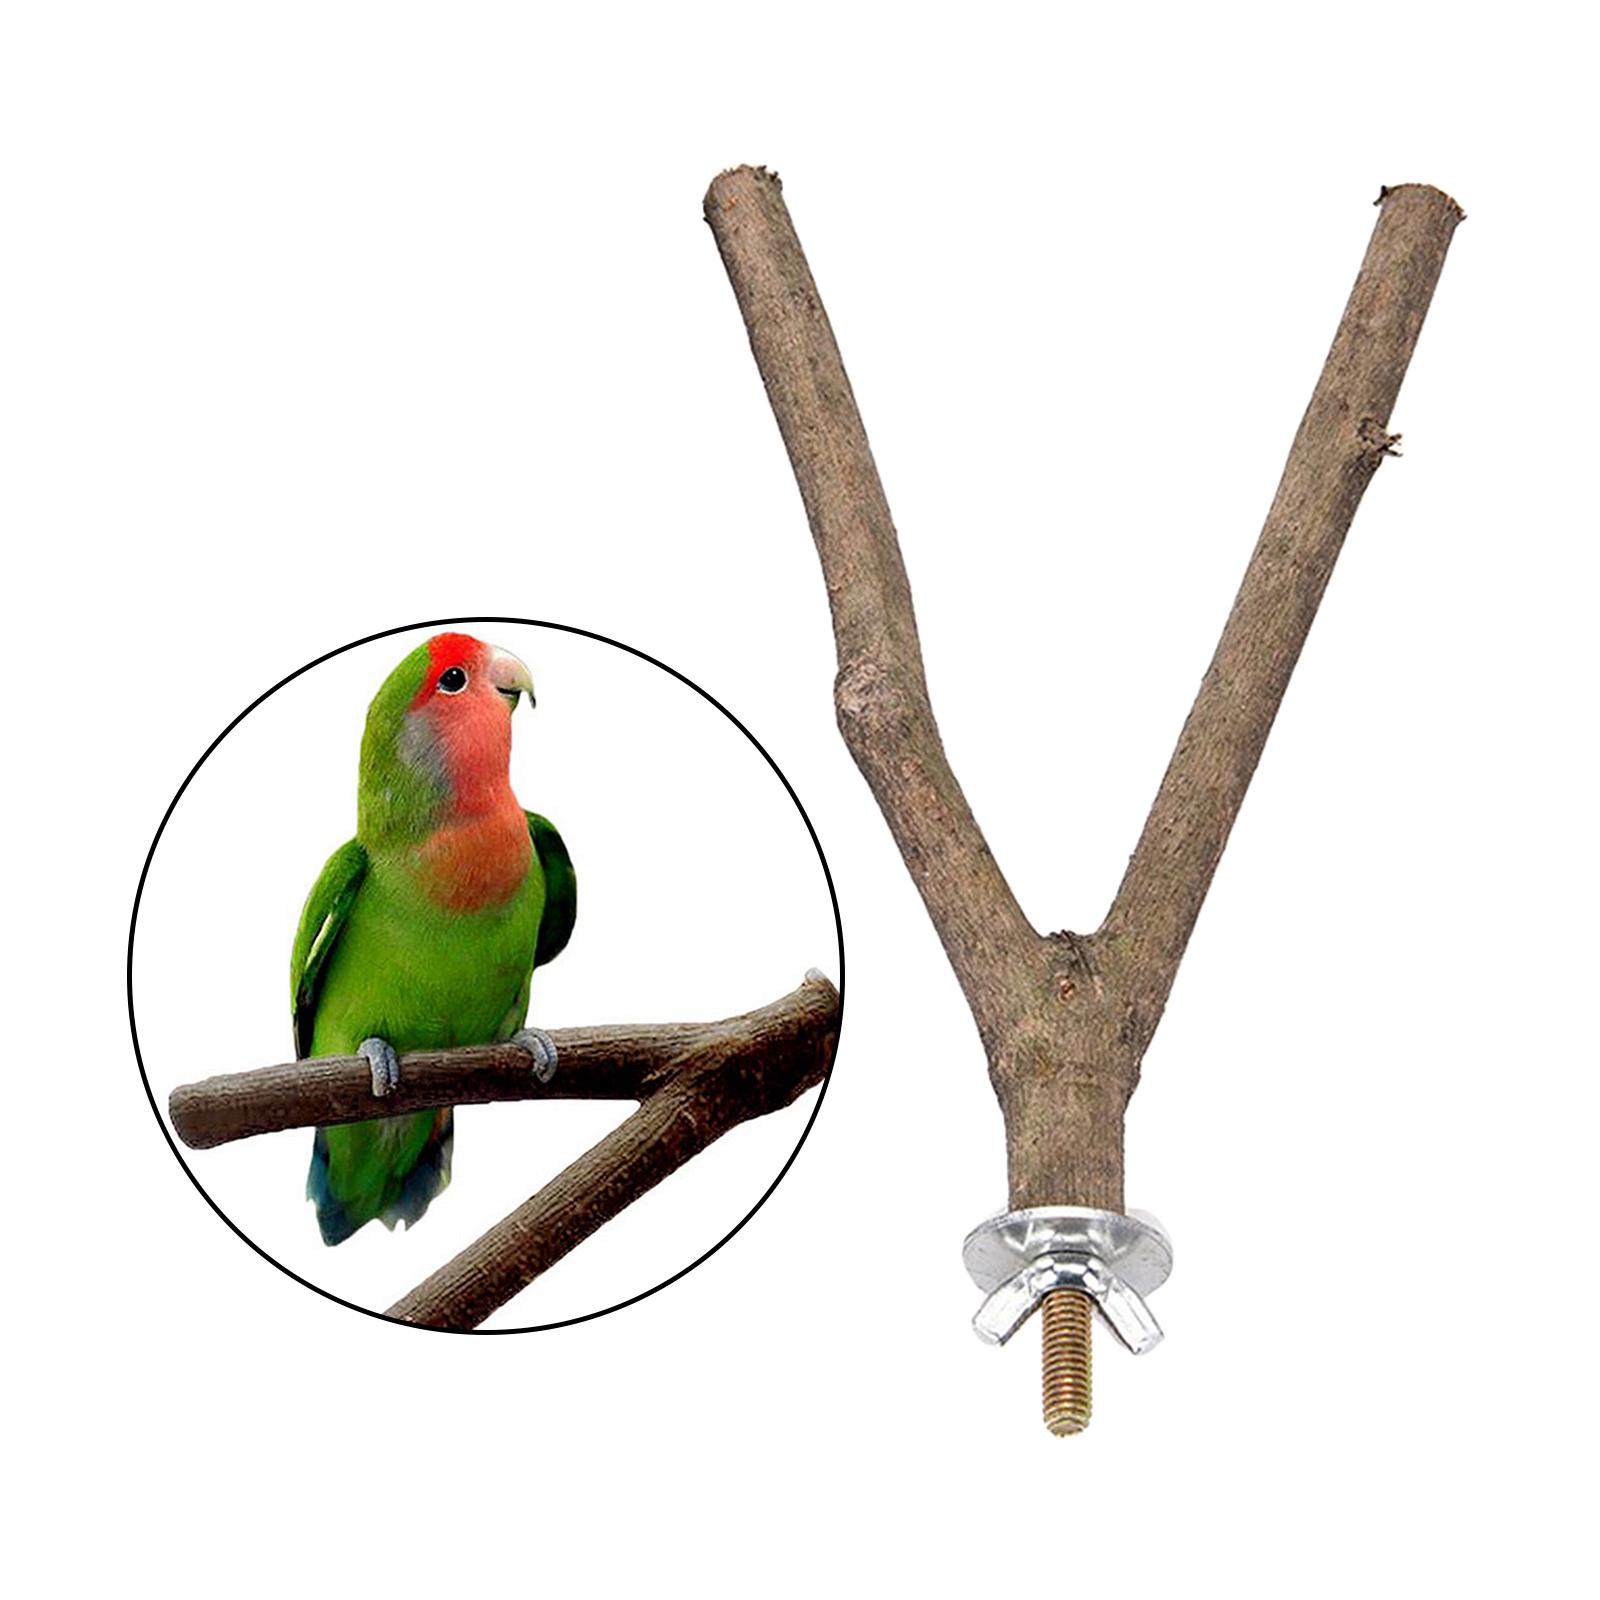 thumbnail 14 - Bird-Perch-Wood-Stand-Bird-Cage-Swing-Branch-for-Parrot-Parakeet-Cockatiel